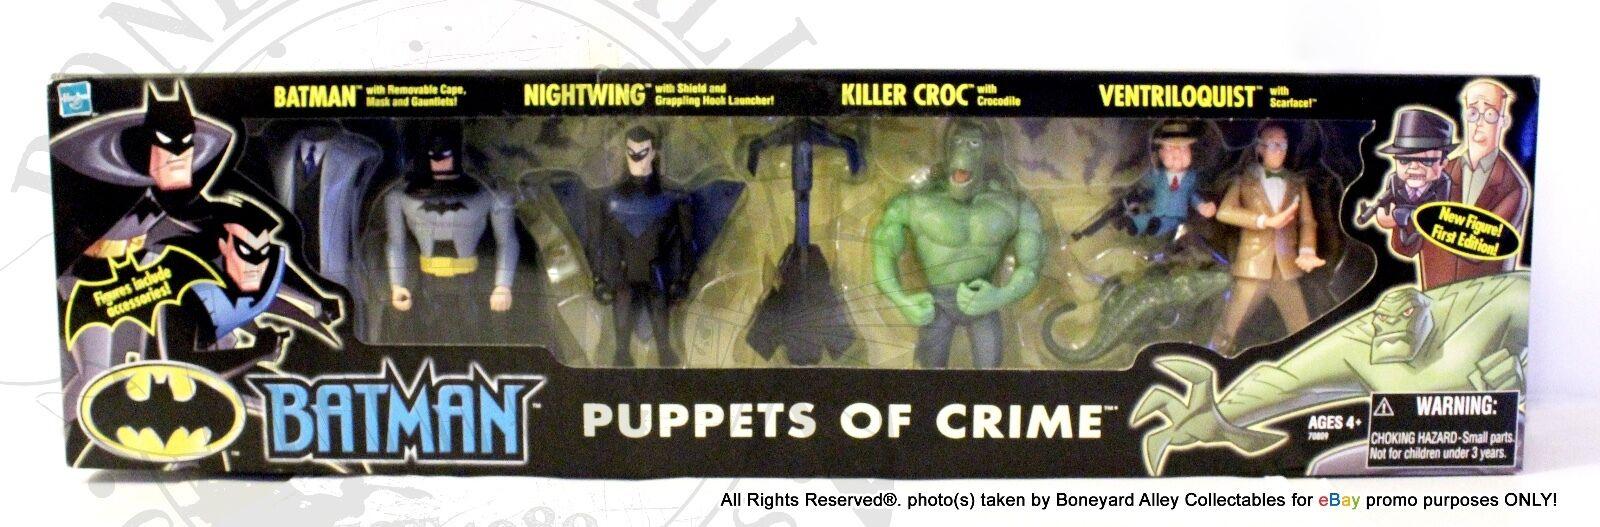 BATMAN TRU Exclusive PUPPETS OF CRIME MISBNEWRARE-HASBRO